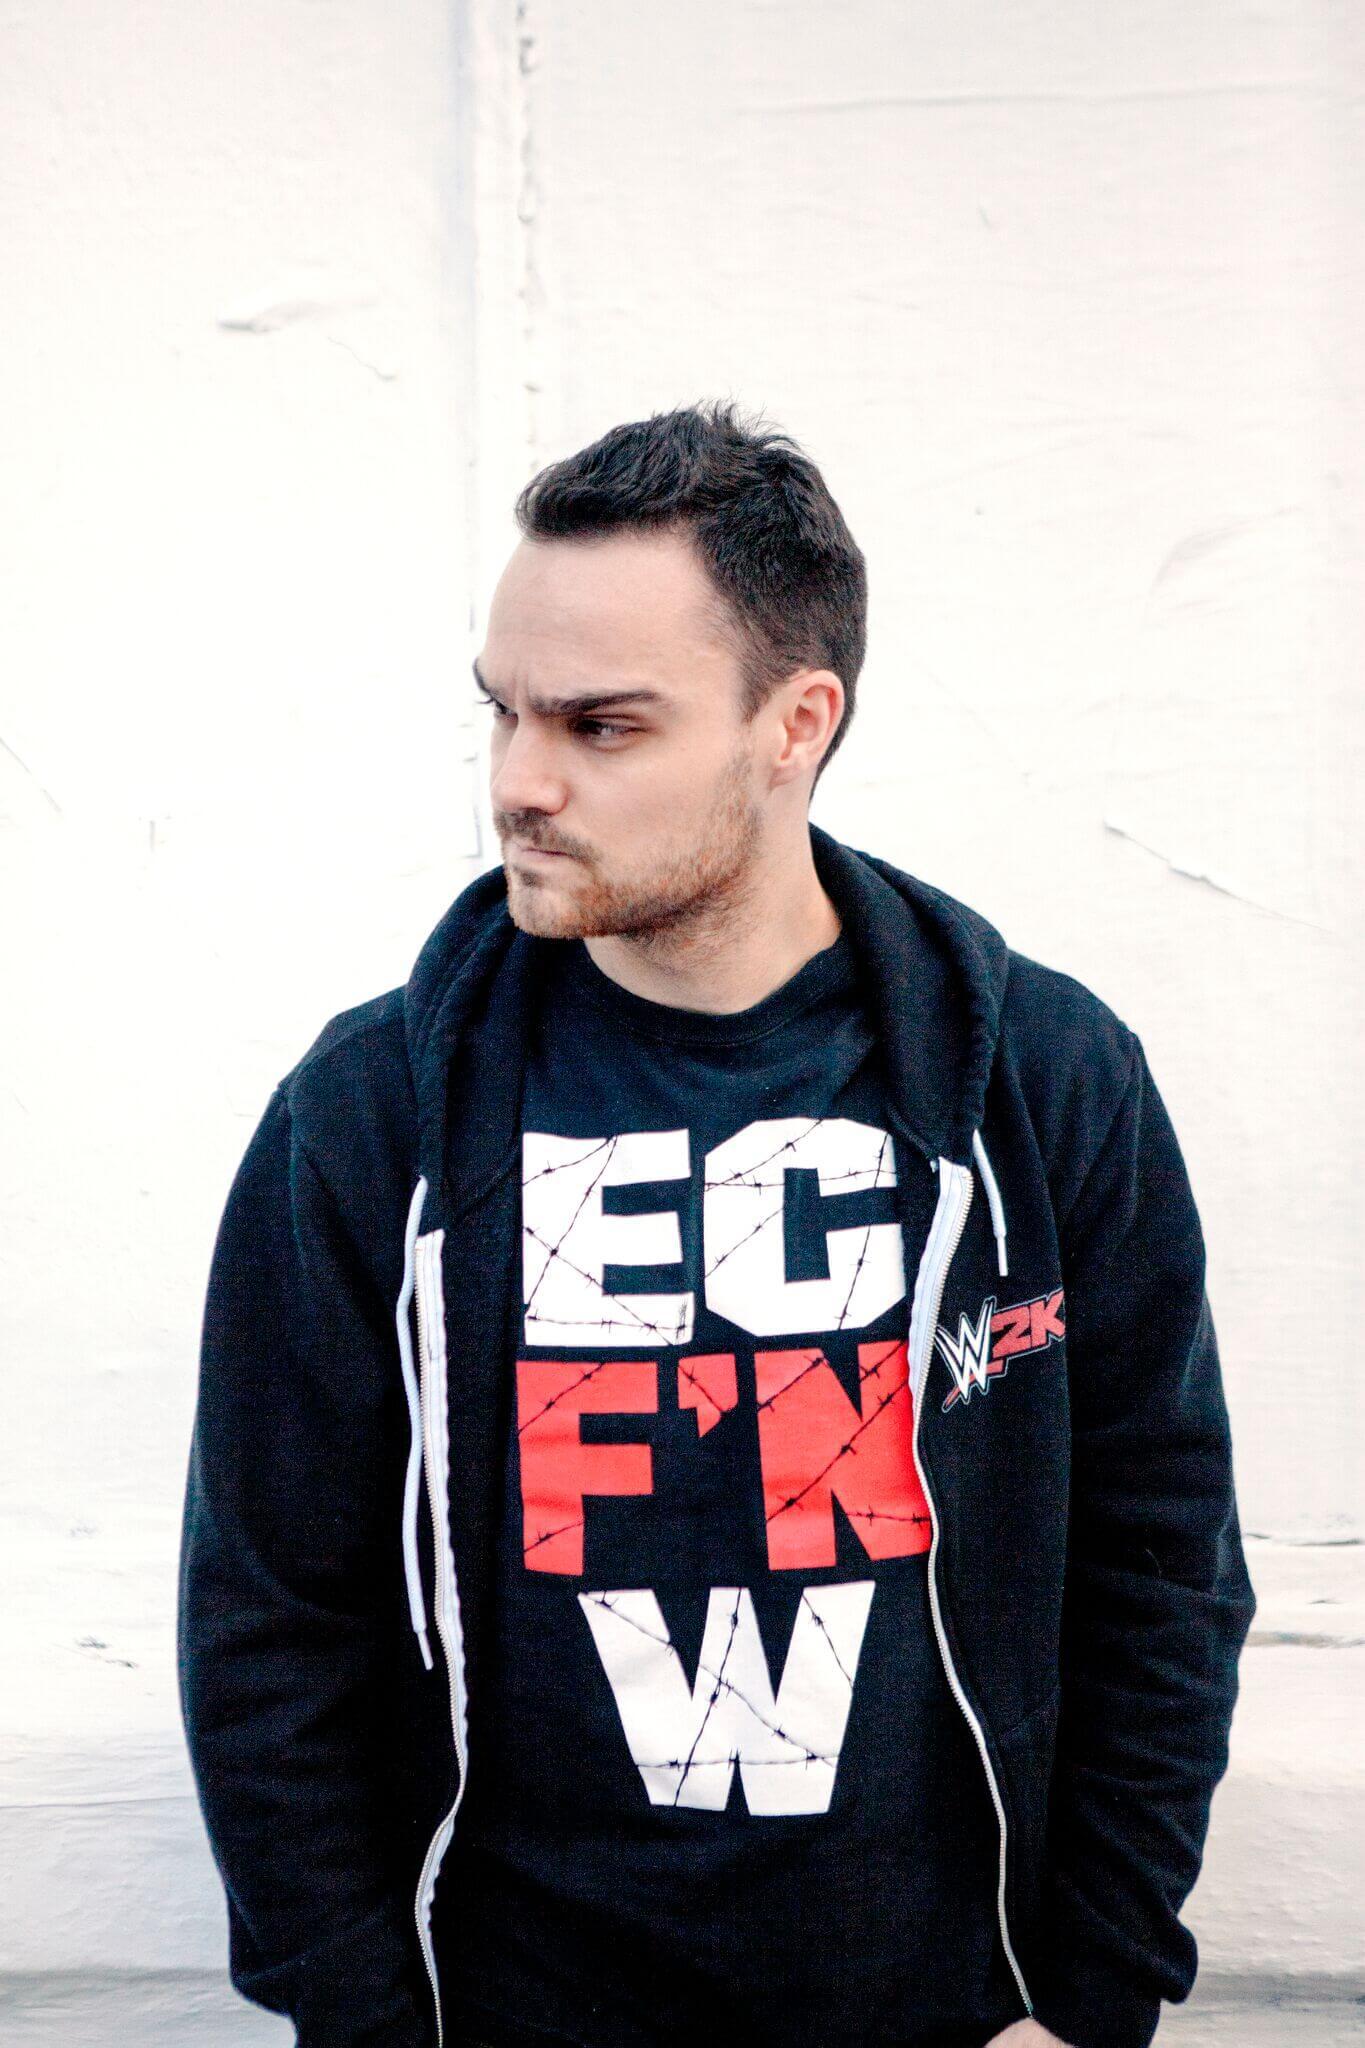 SKAM Artist DJ Jamie Iovine - Meet the SKAM Artist